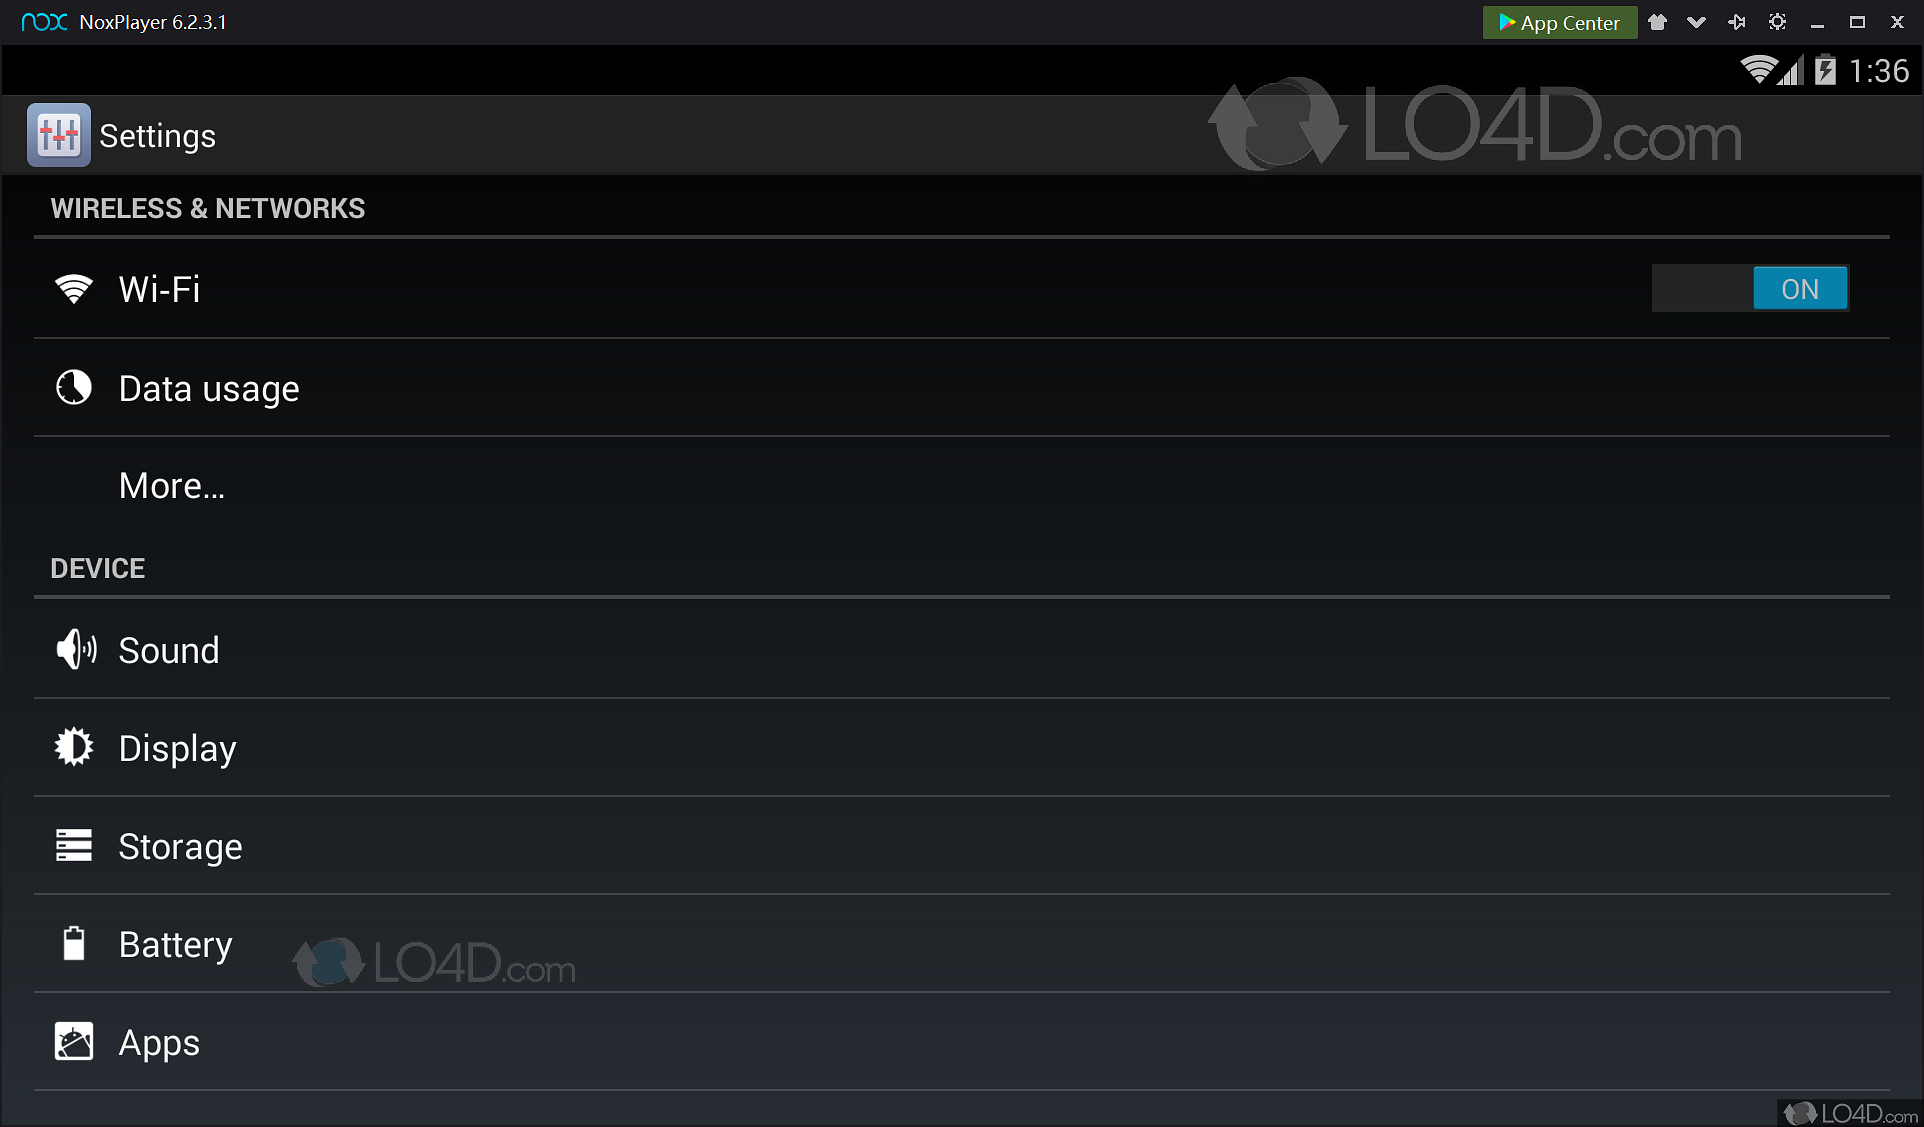 download noxplayer 6.2.7.0